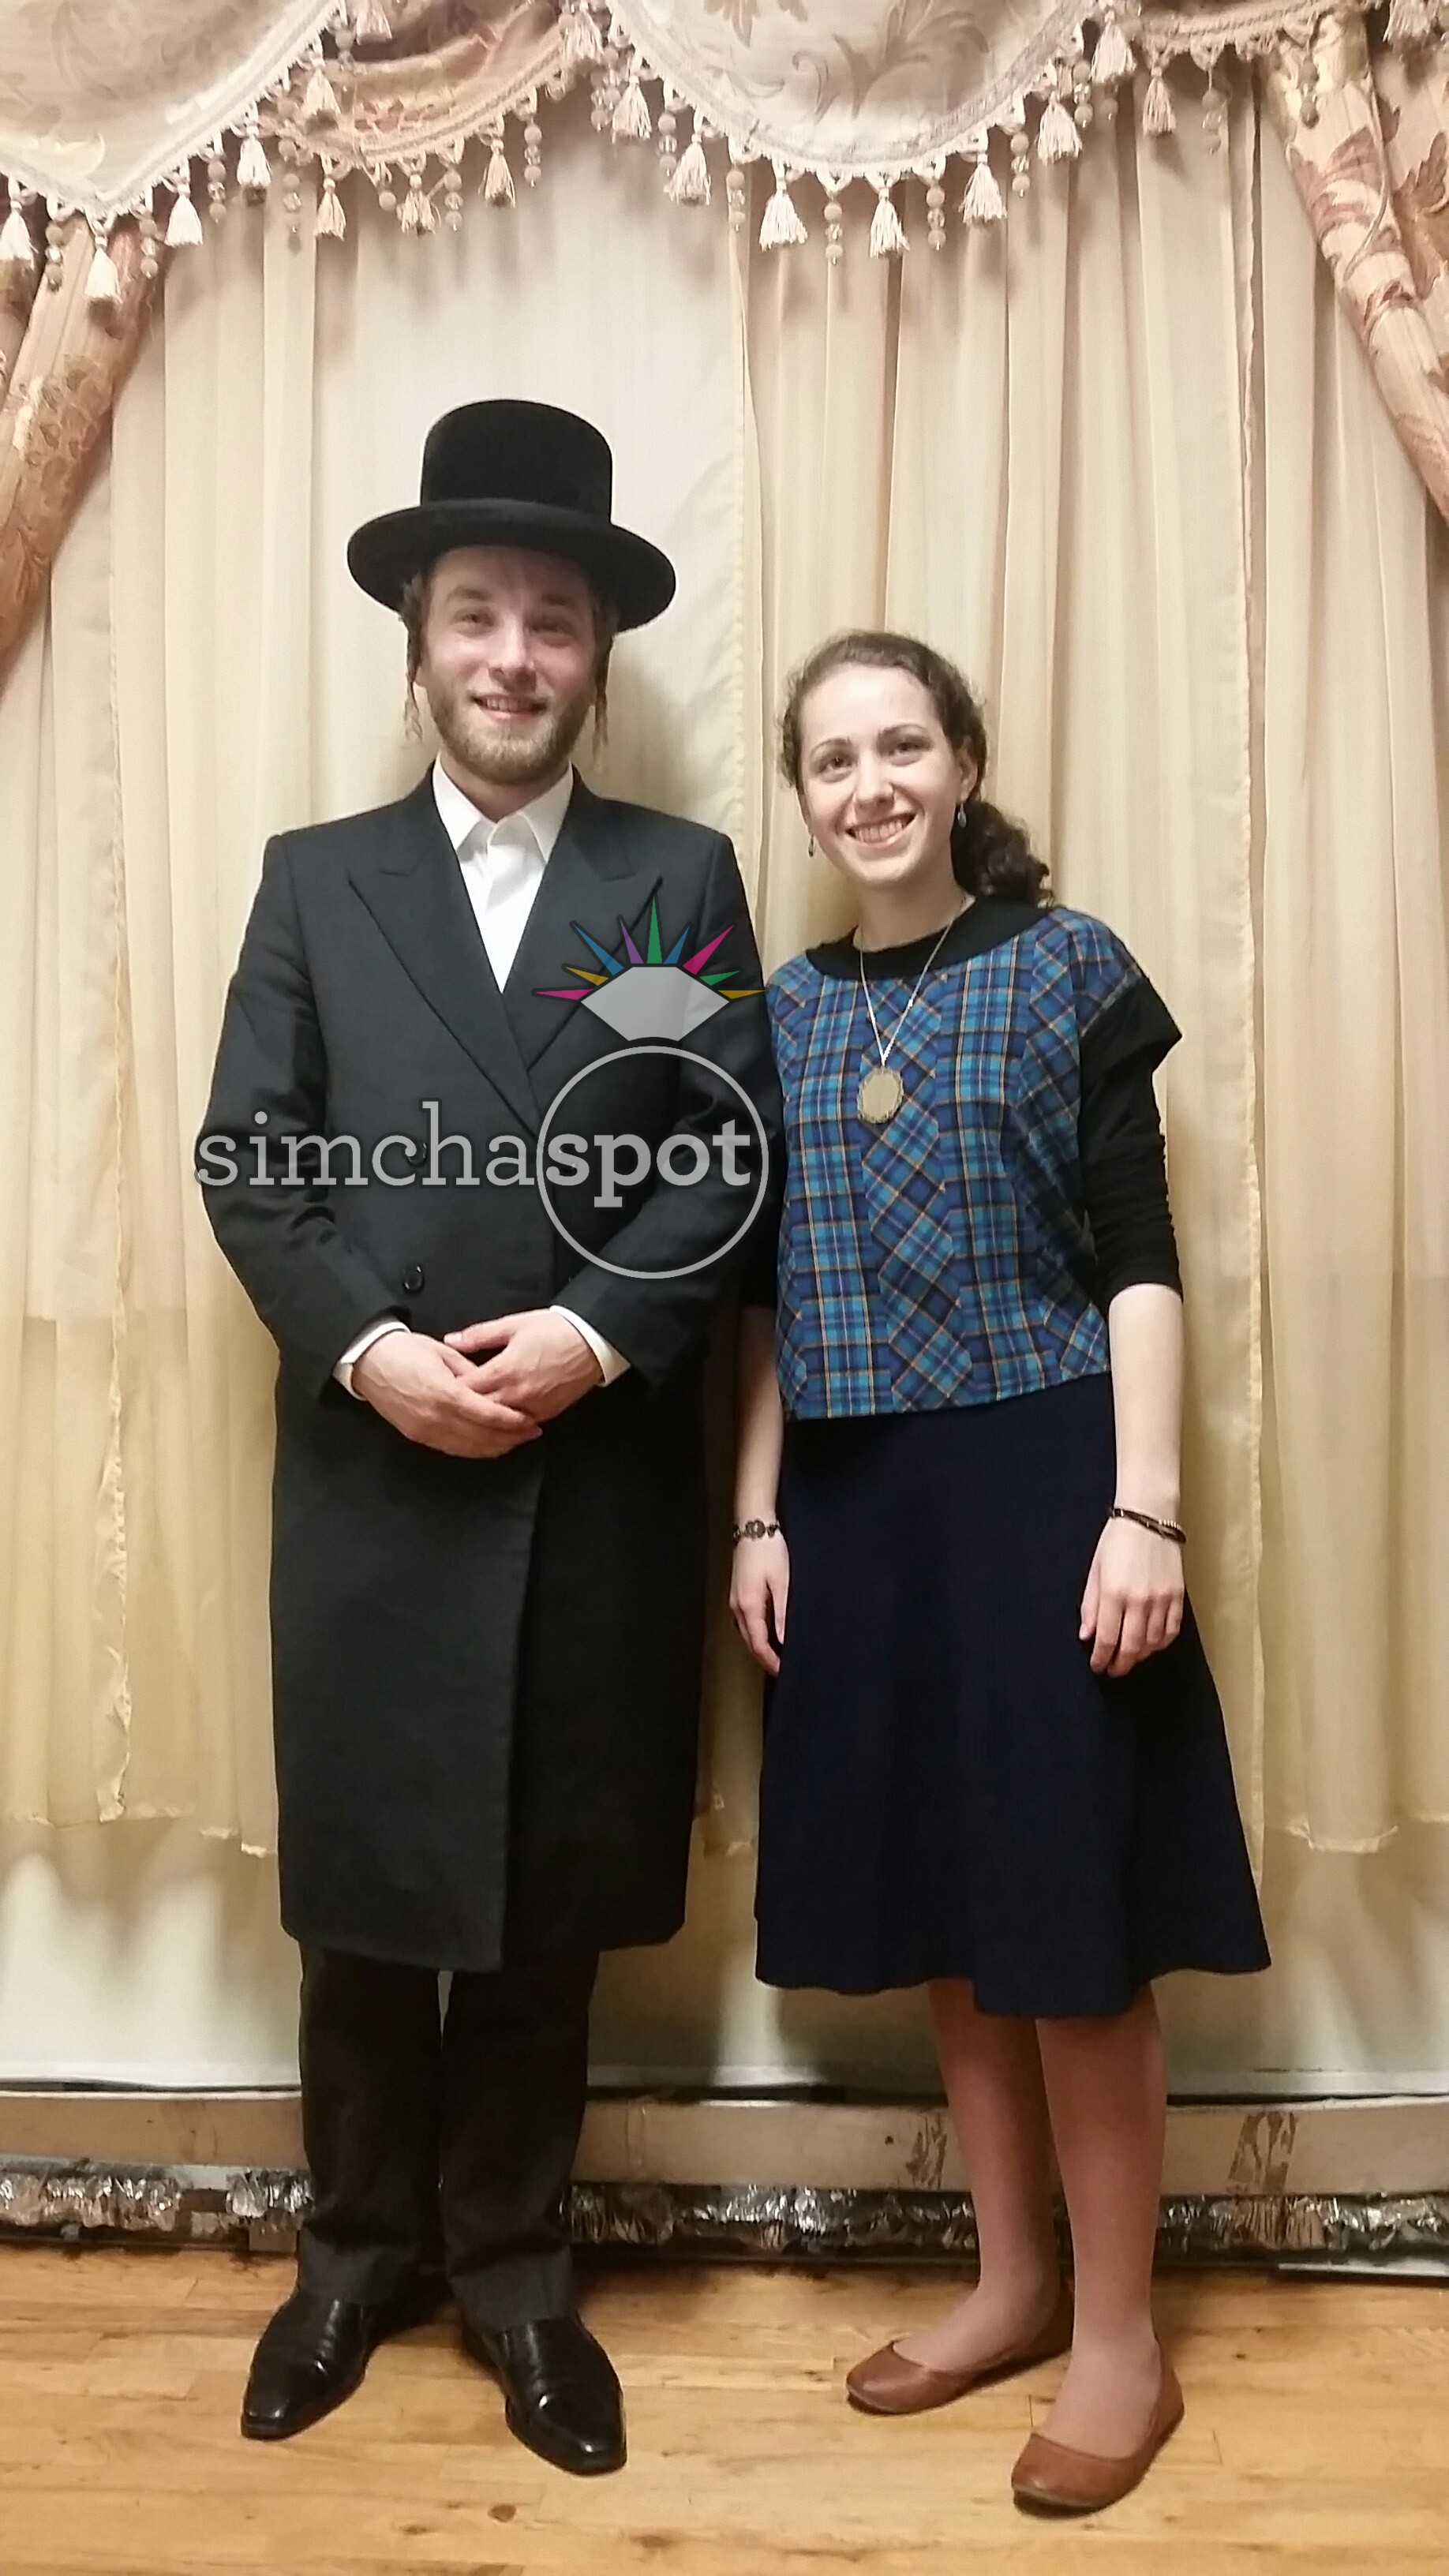 Engagement of Miriam Oliel  Brooklyn  and Shlome Kraus  Manchester